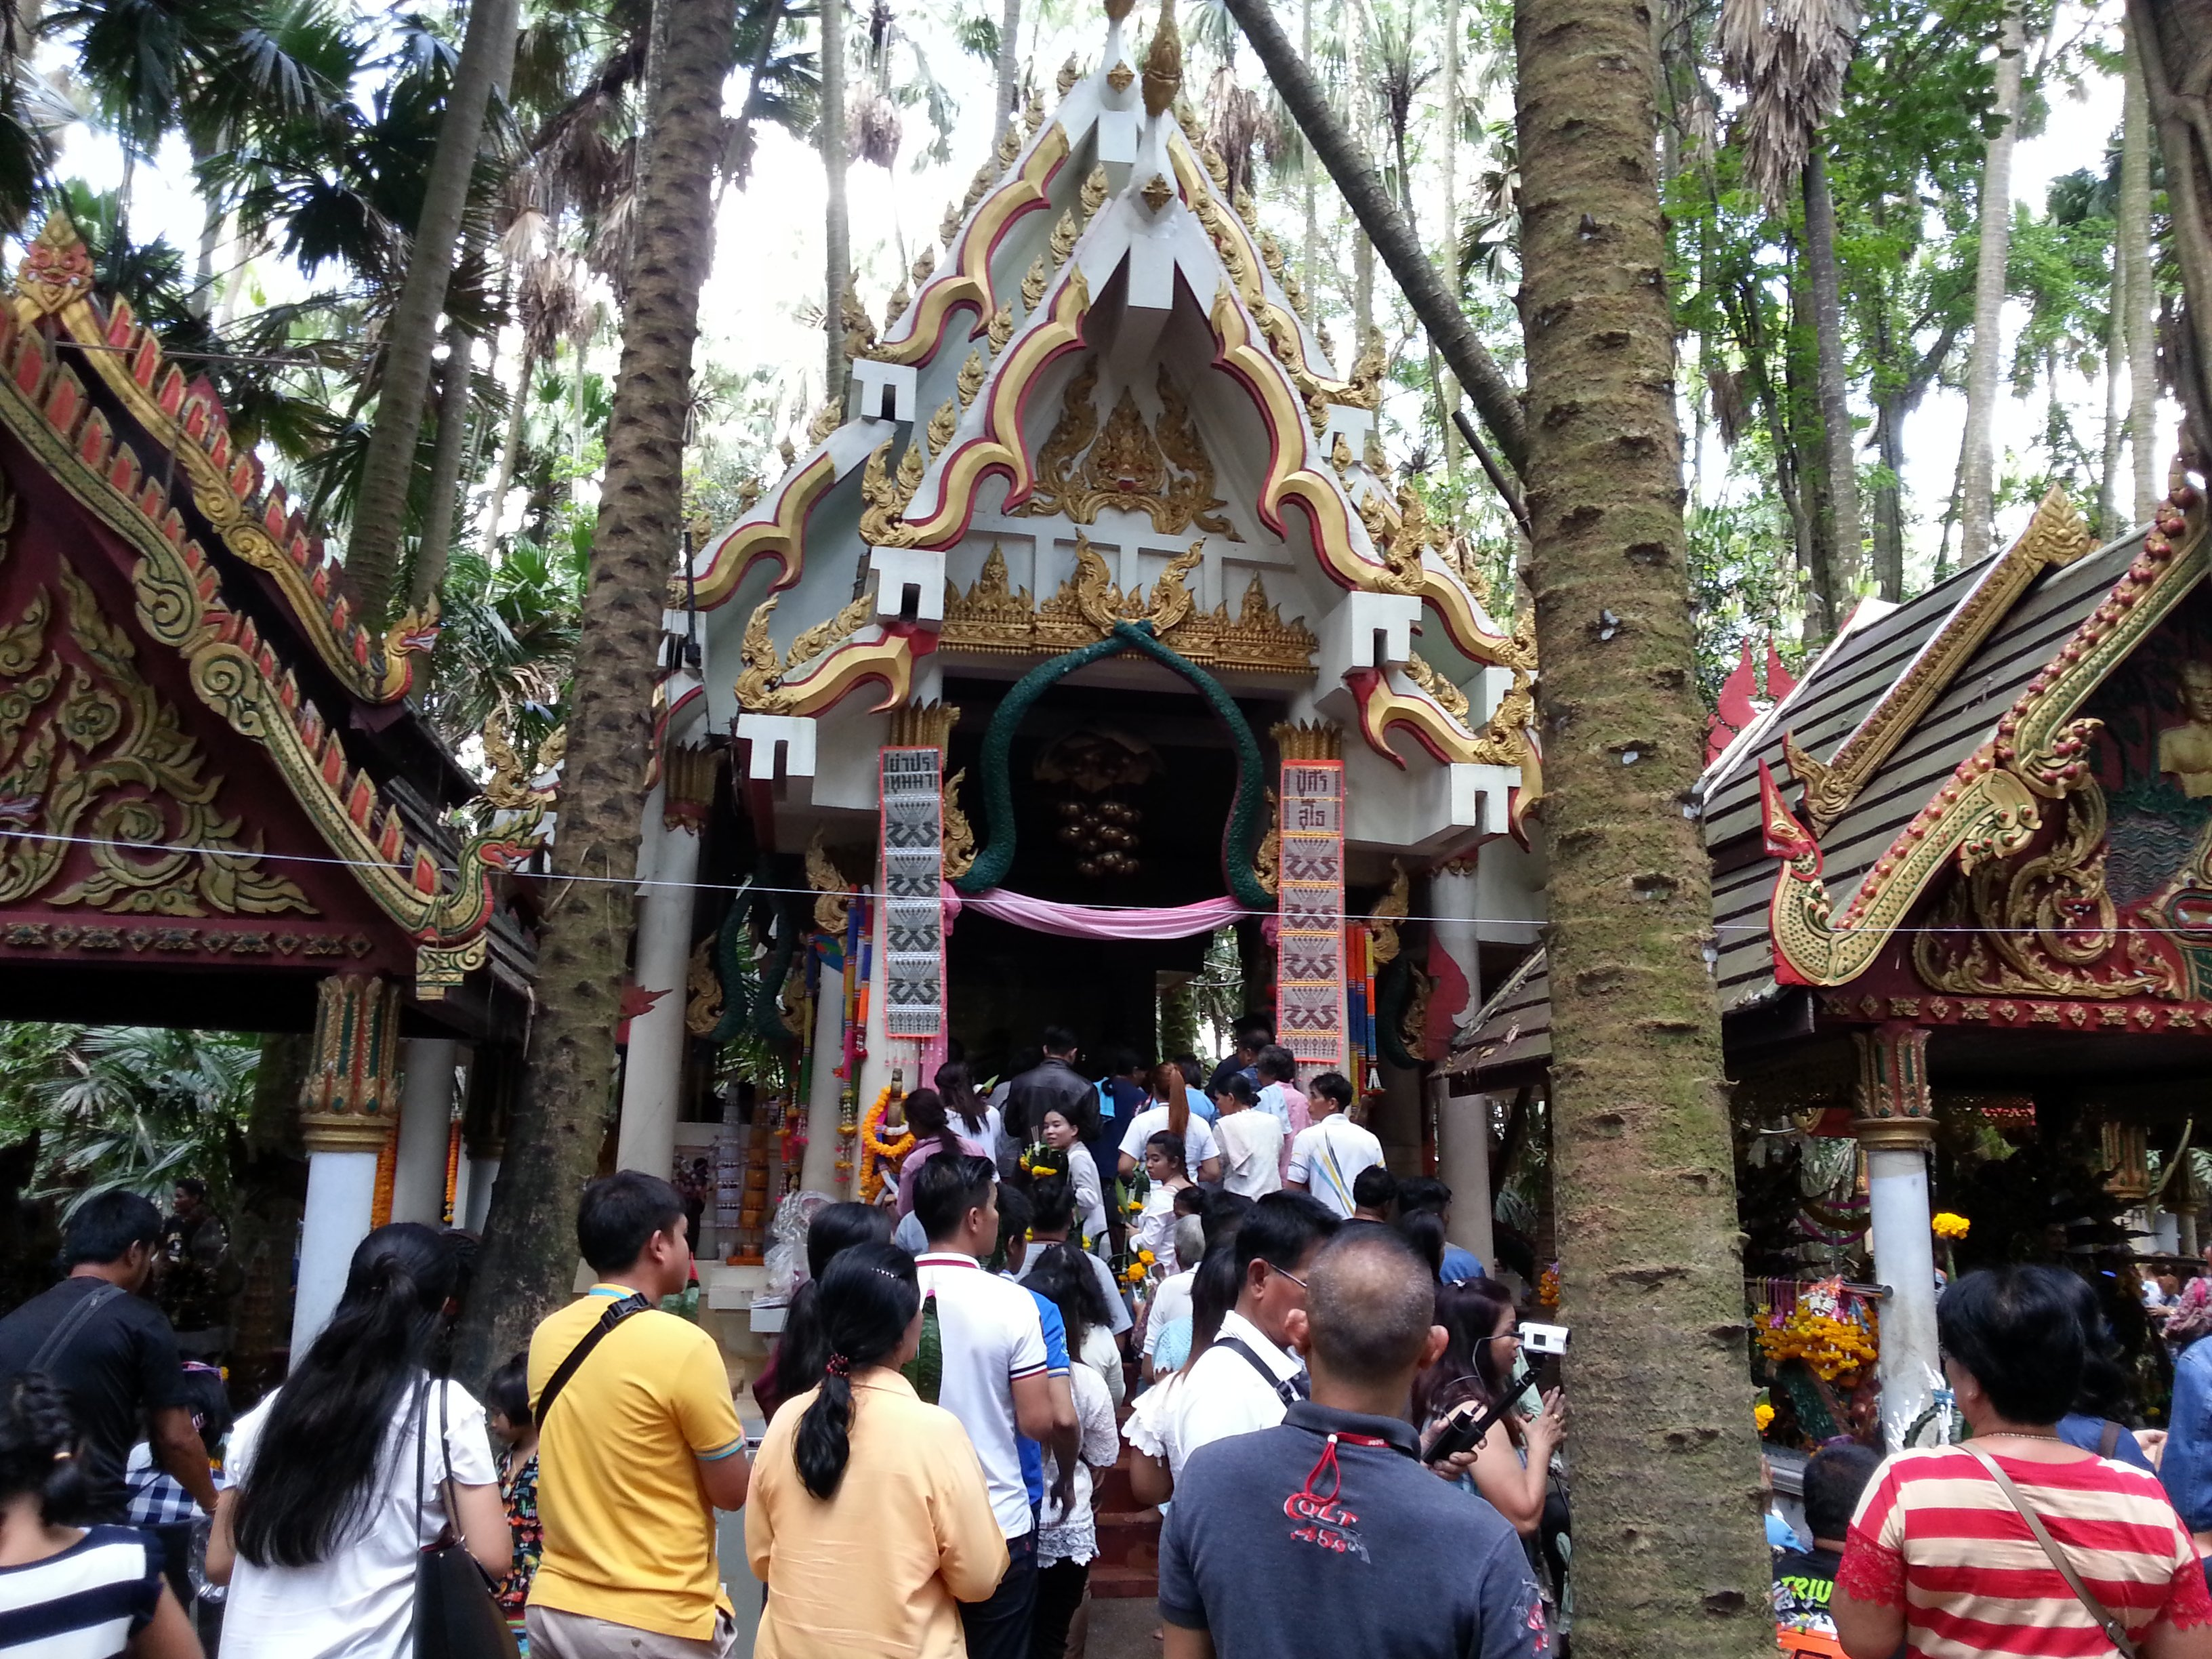 Three shrines in Wat Kham Chanot Forest